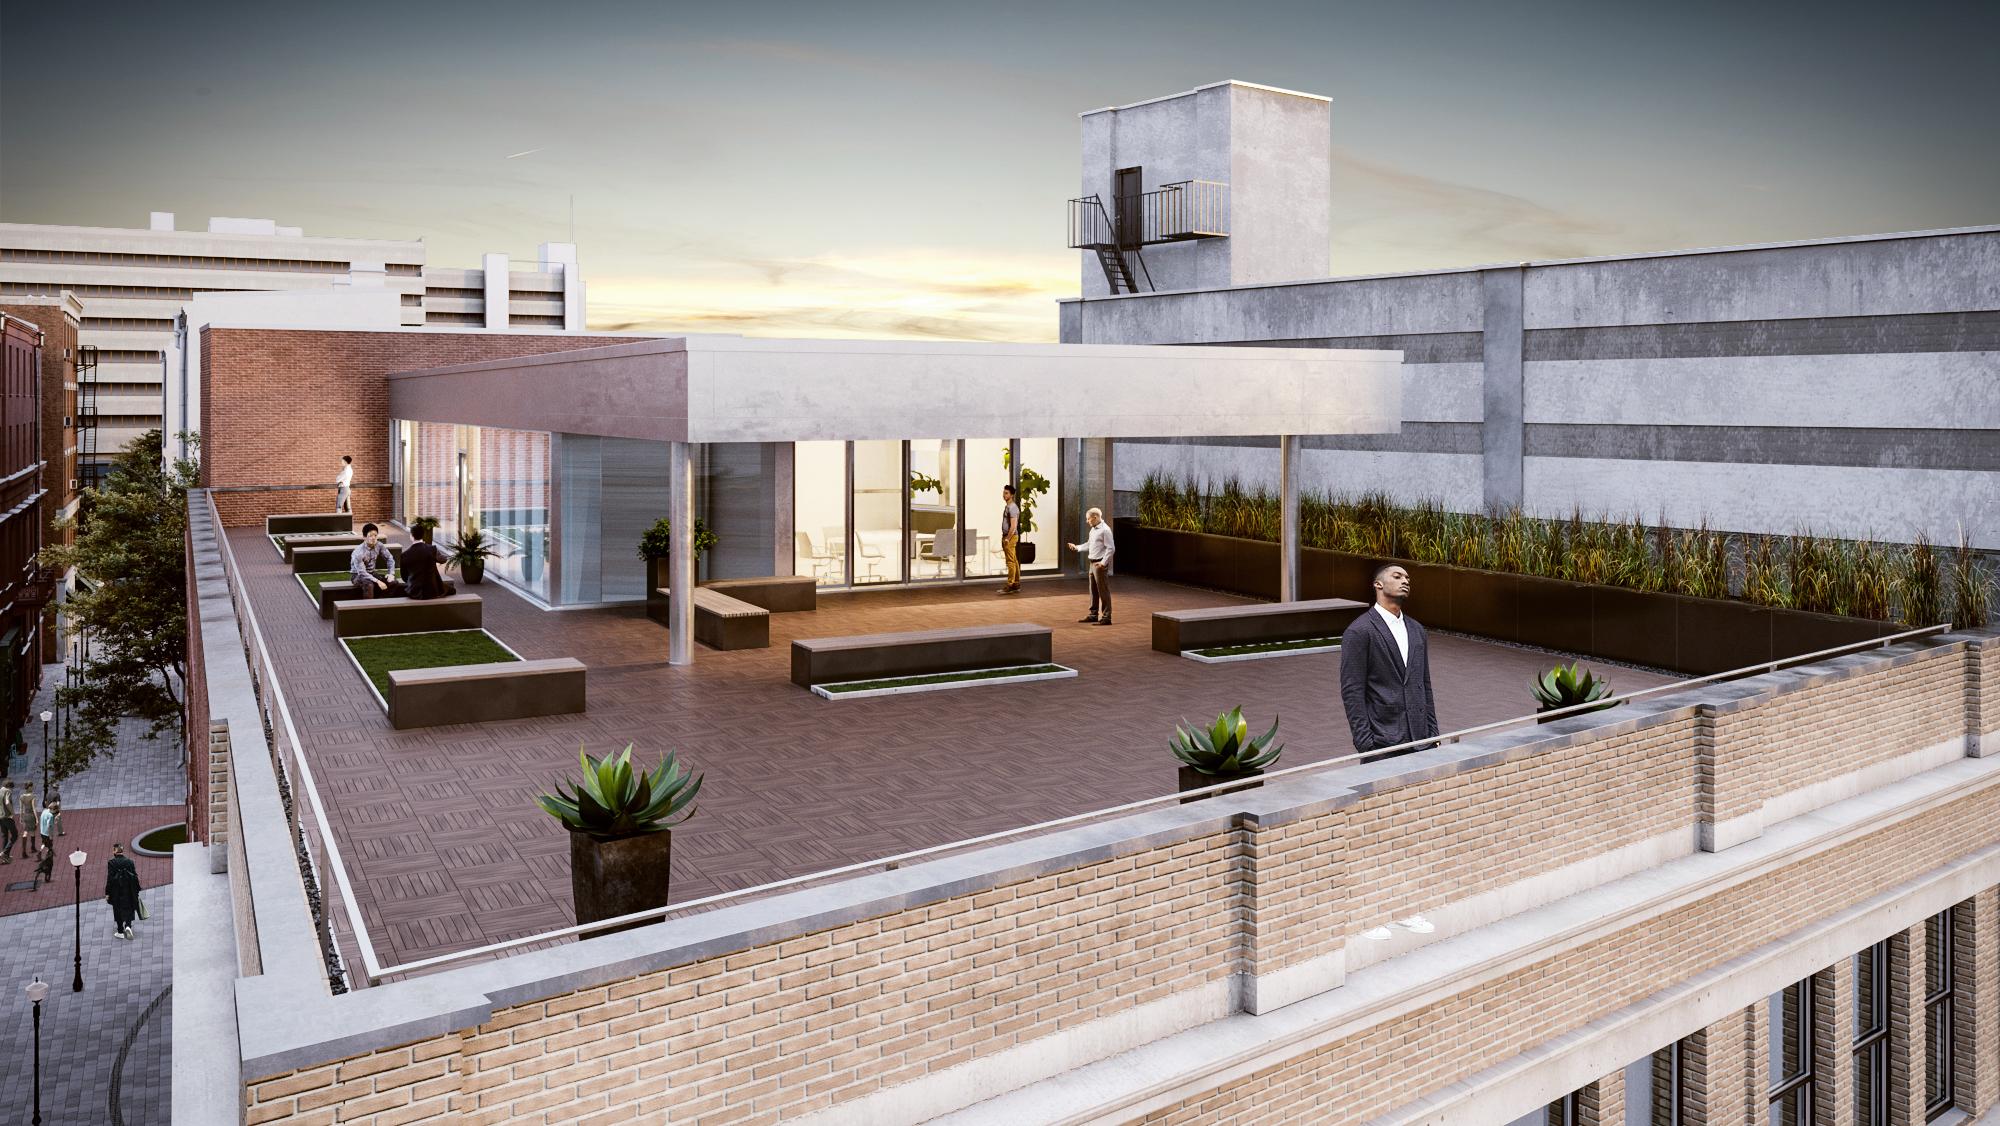 EDGE_Exterior_Roof_Final.jpg